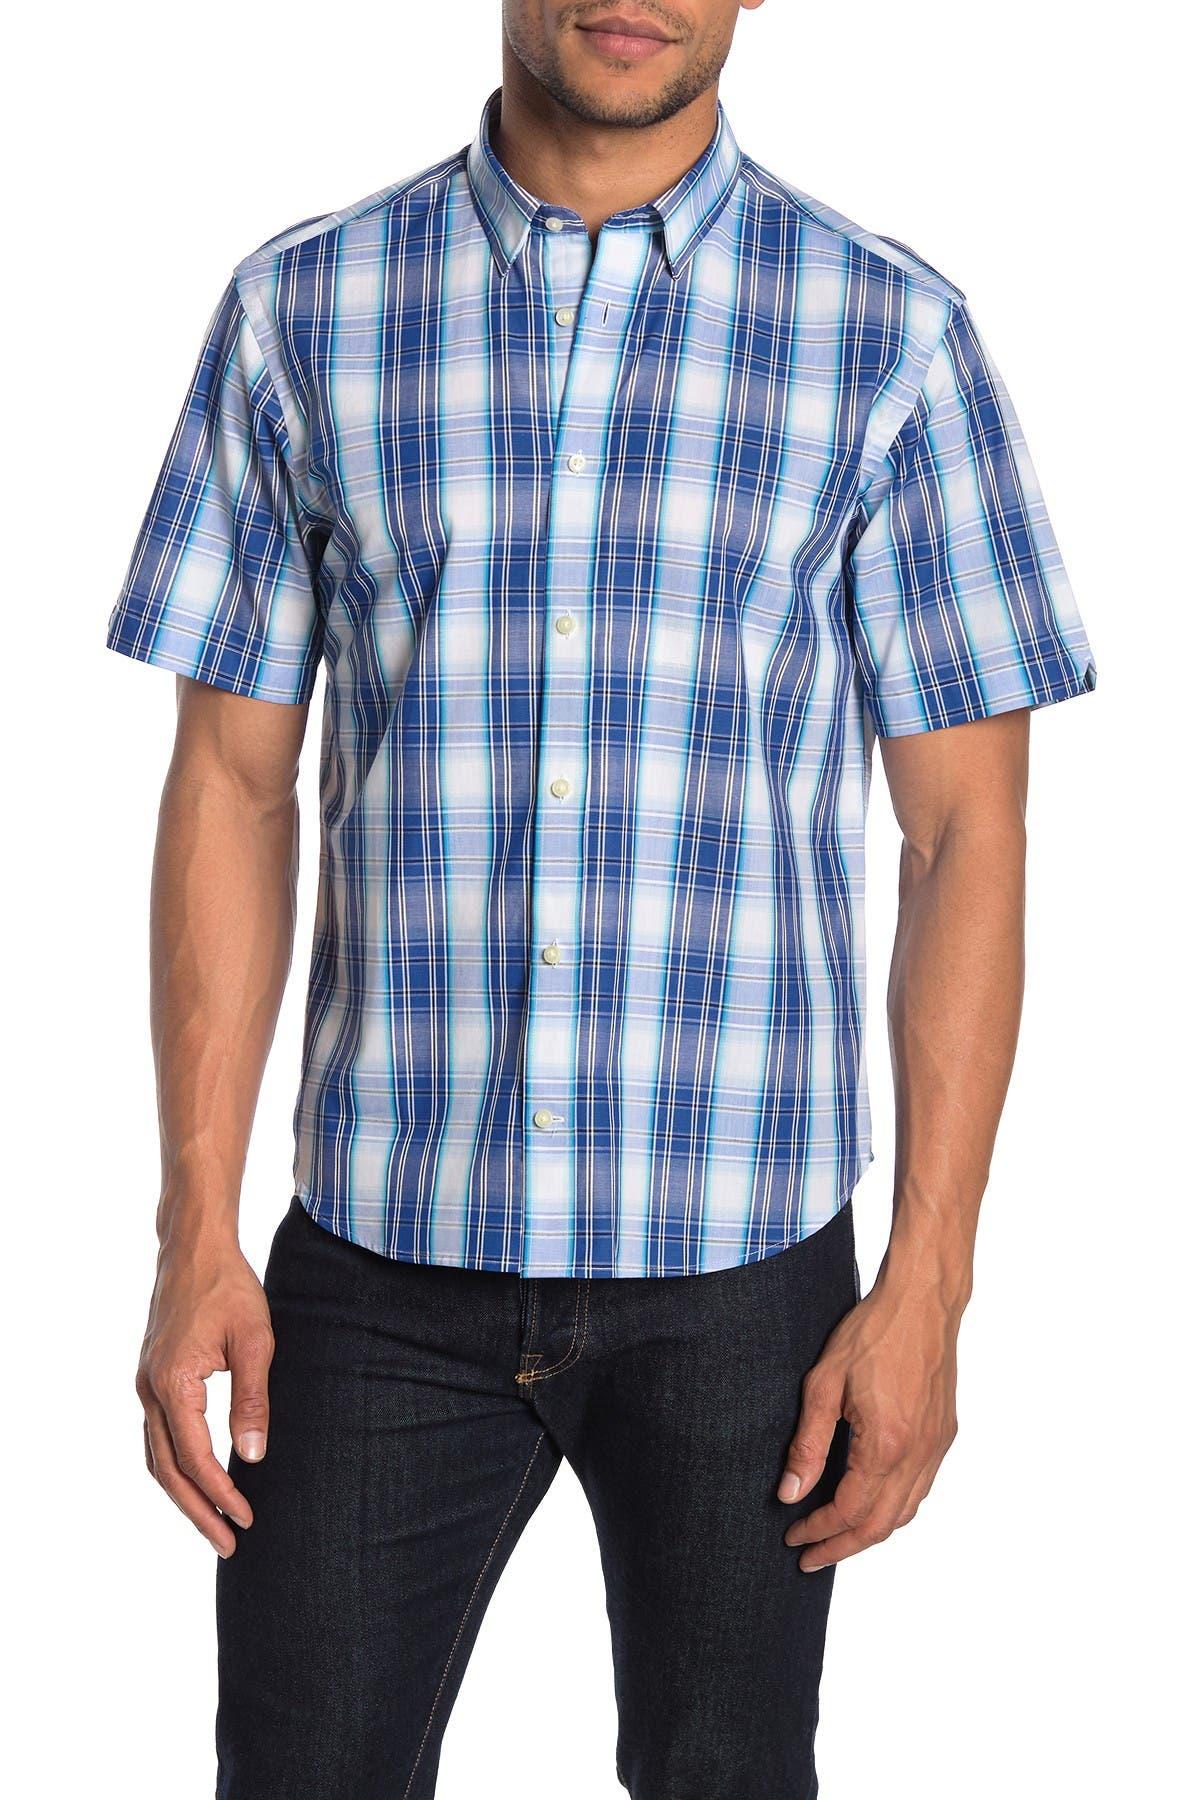 Image of Thomas Dean Plaid Short Sleeve Regular Fit Shirt